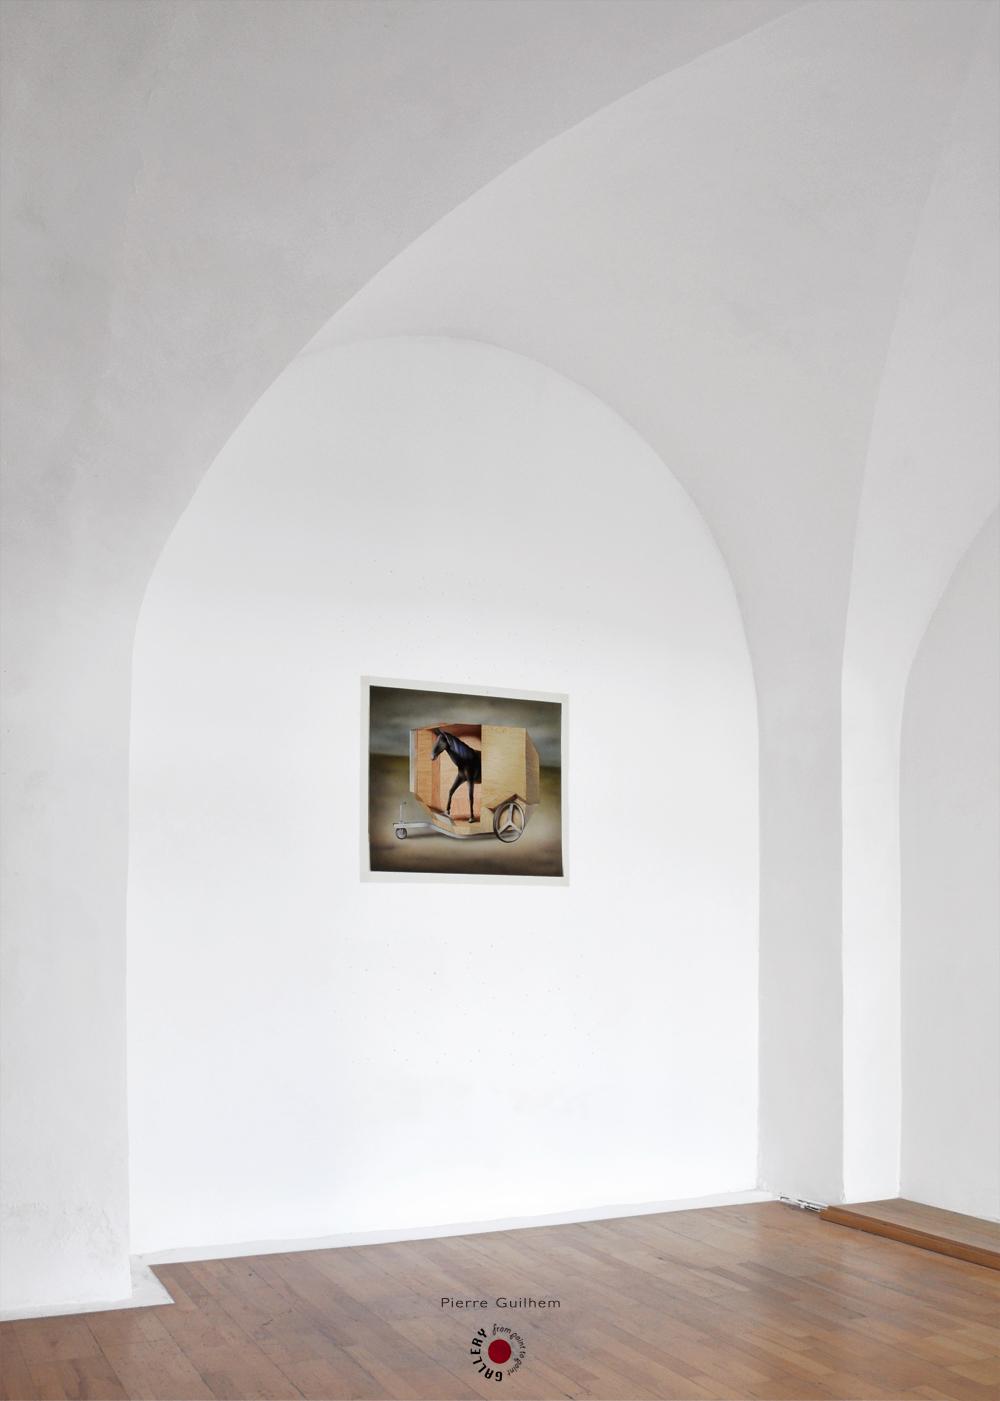 Exposition-Pierre-Guilhem-Point-to-Point-Studio.jpg